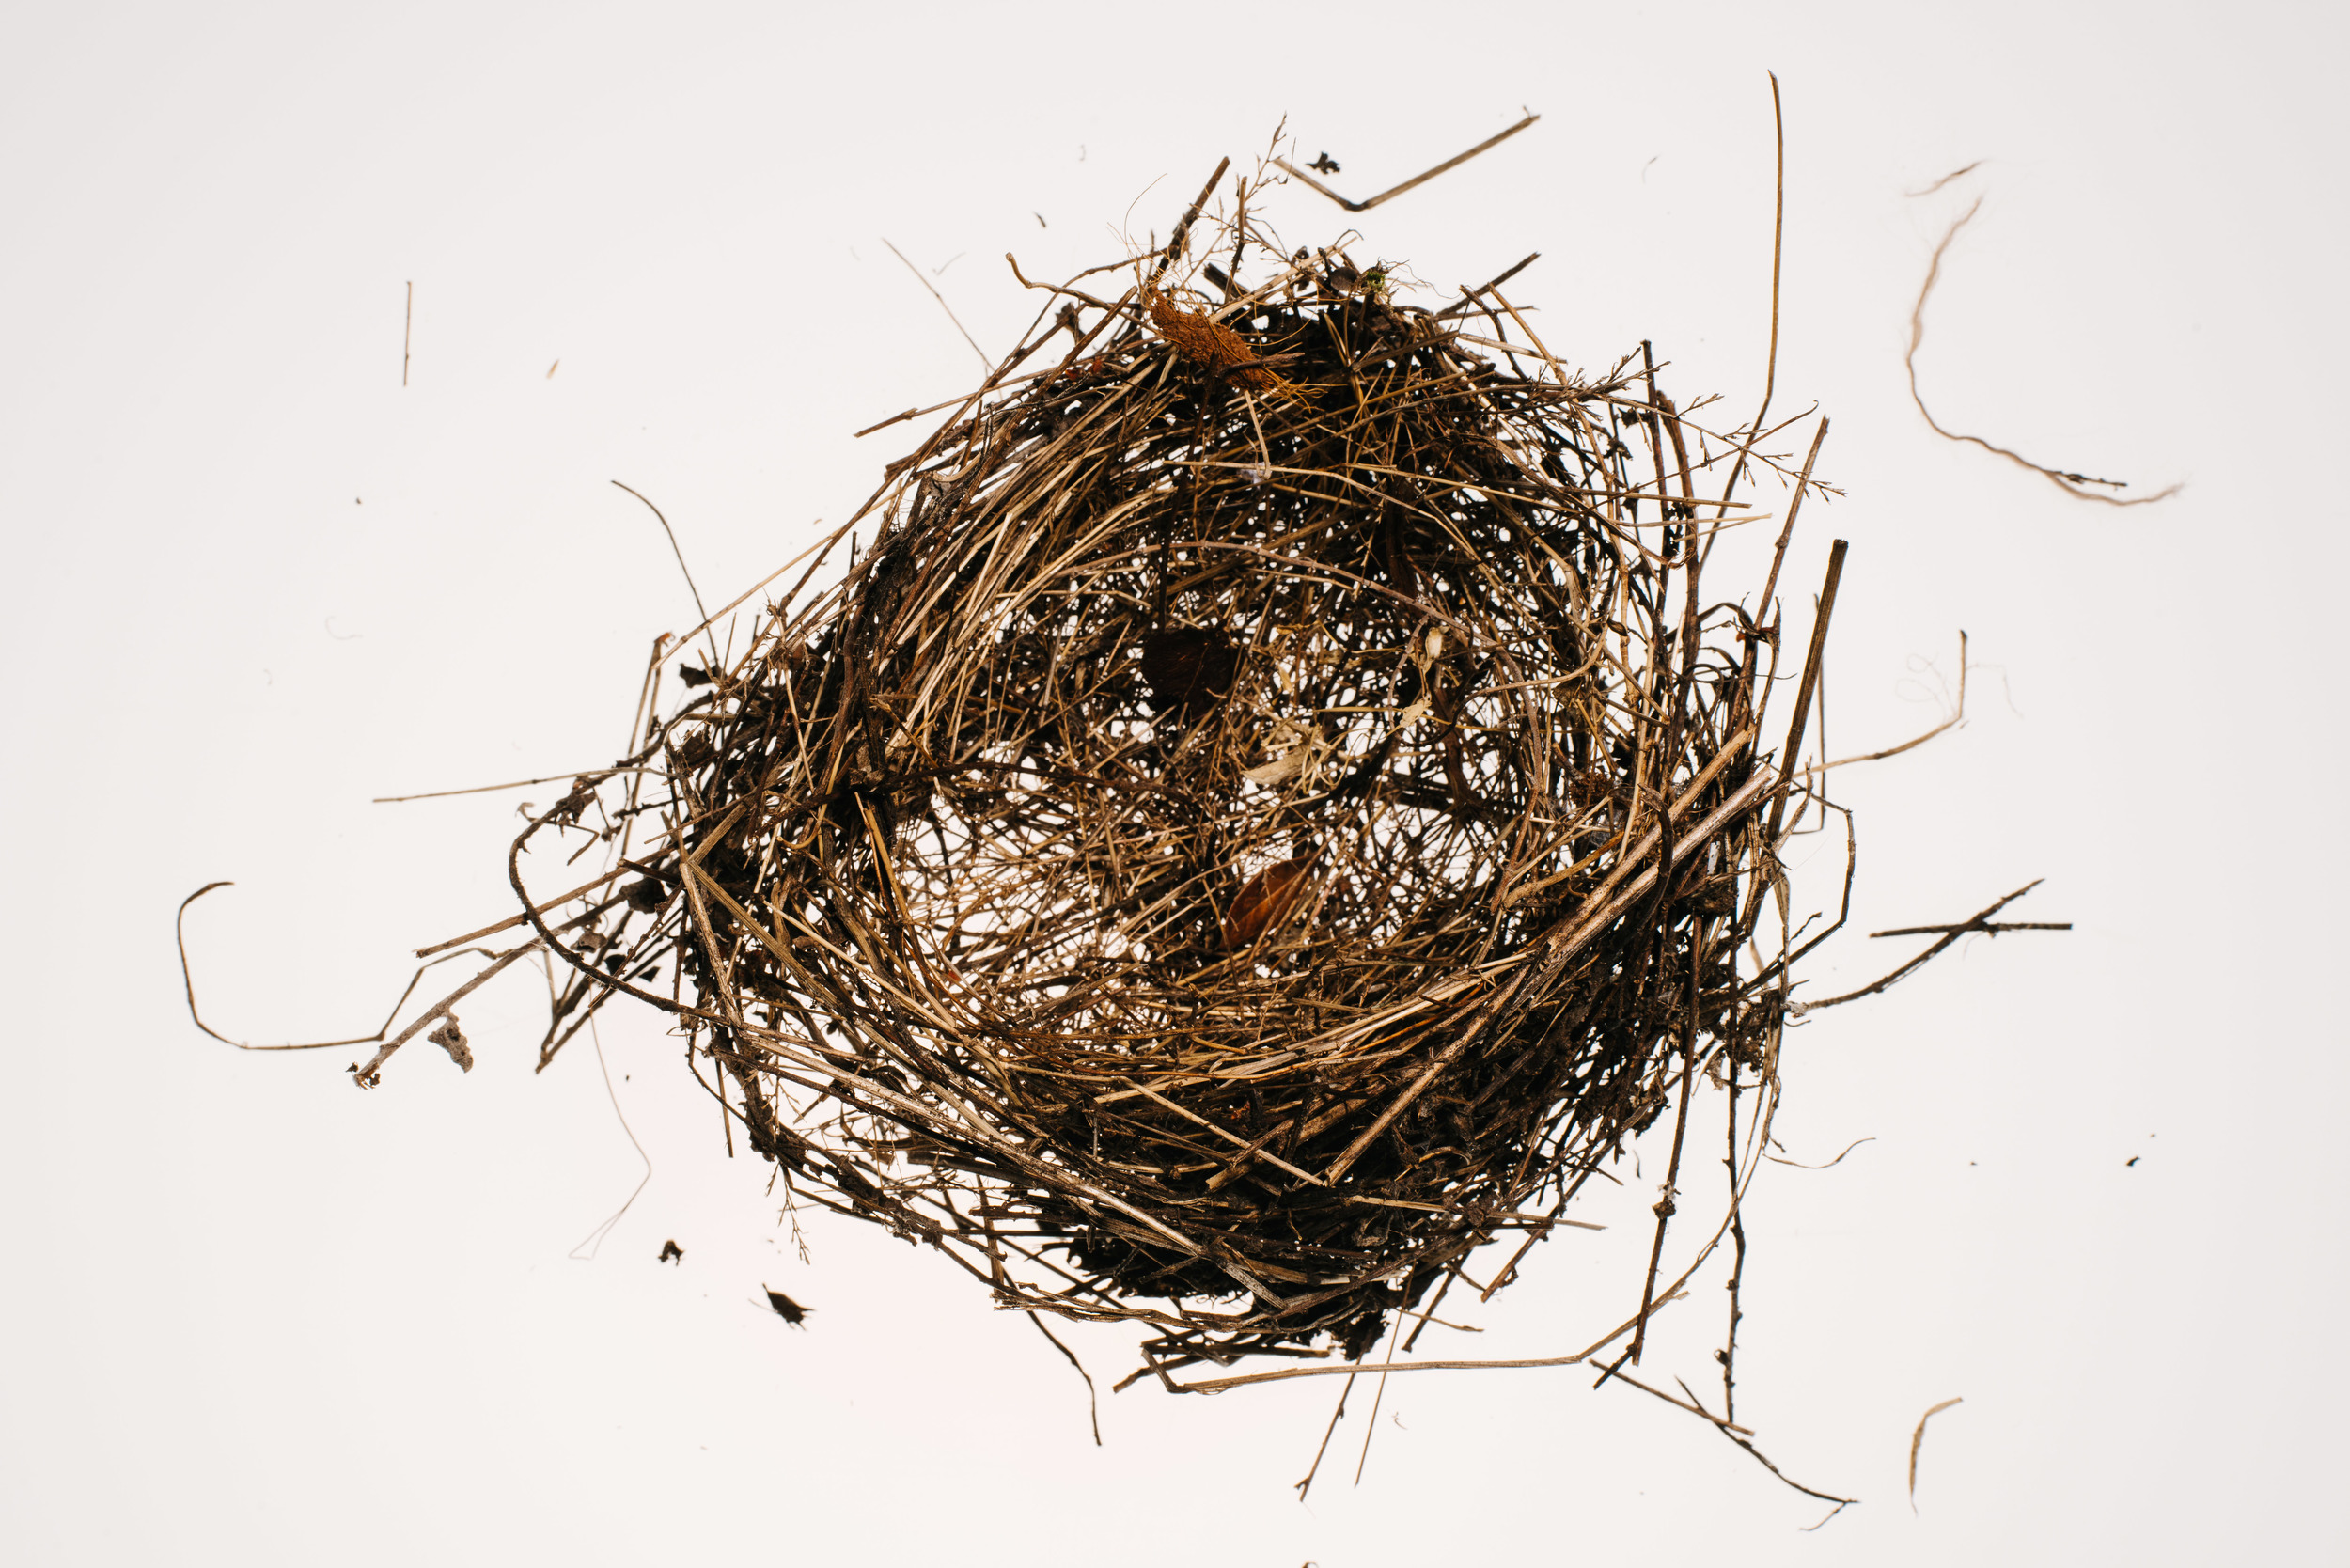 Bird_Nests-0023.jpg